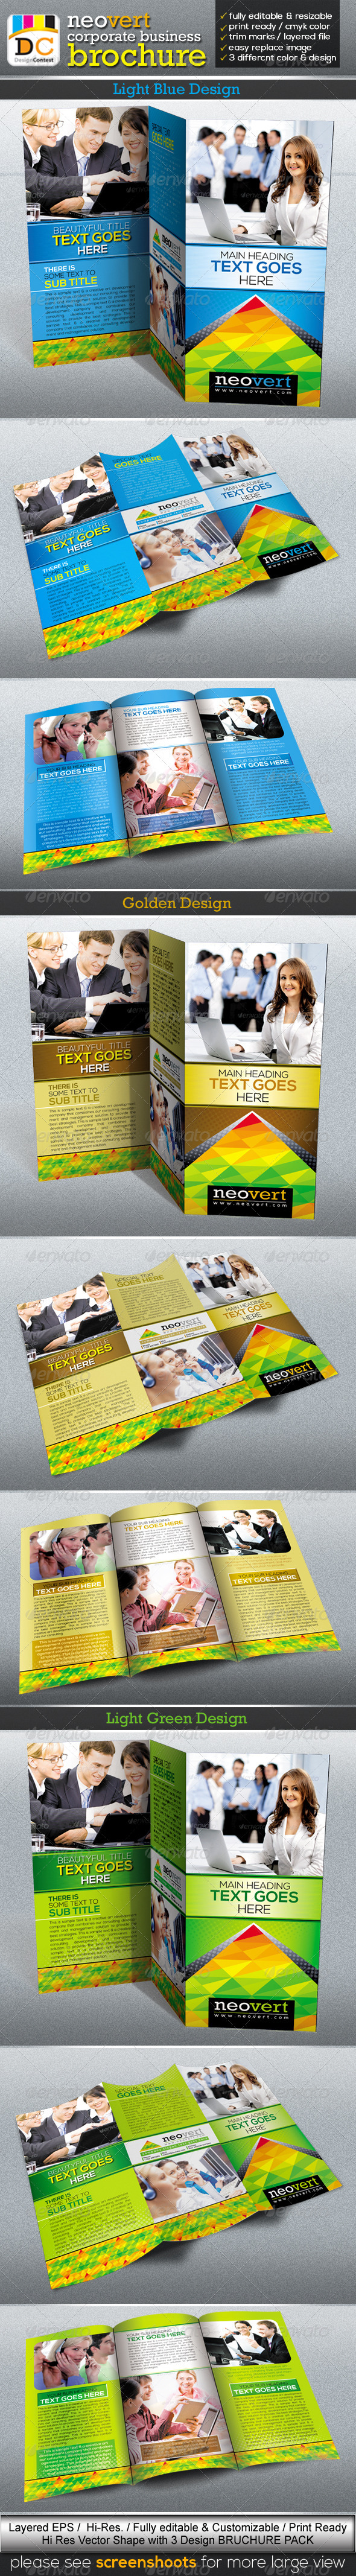 GraphicRiver NeoVert Tri-fold Corporate Business Brochure 4022277